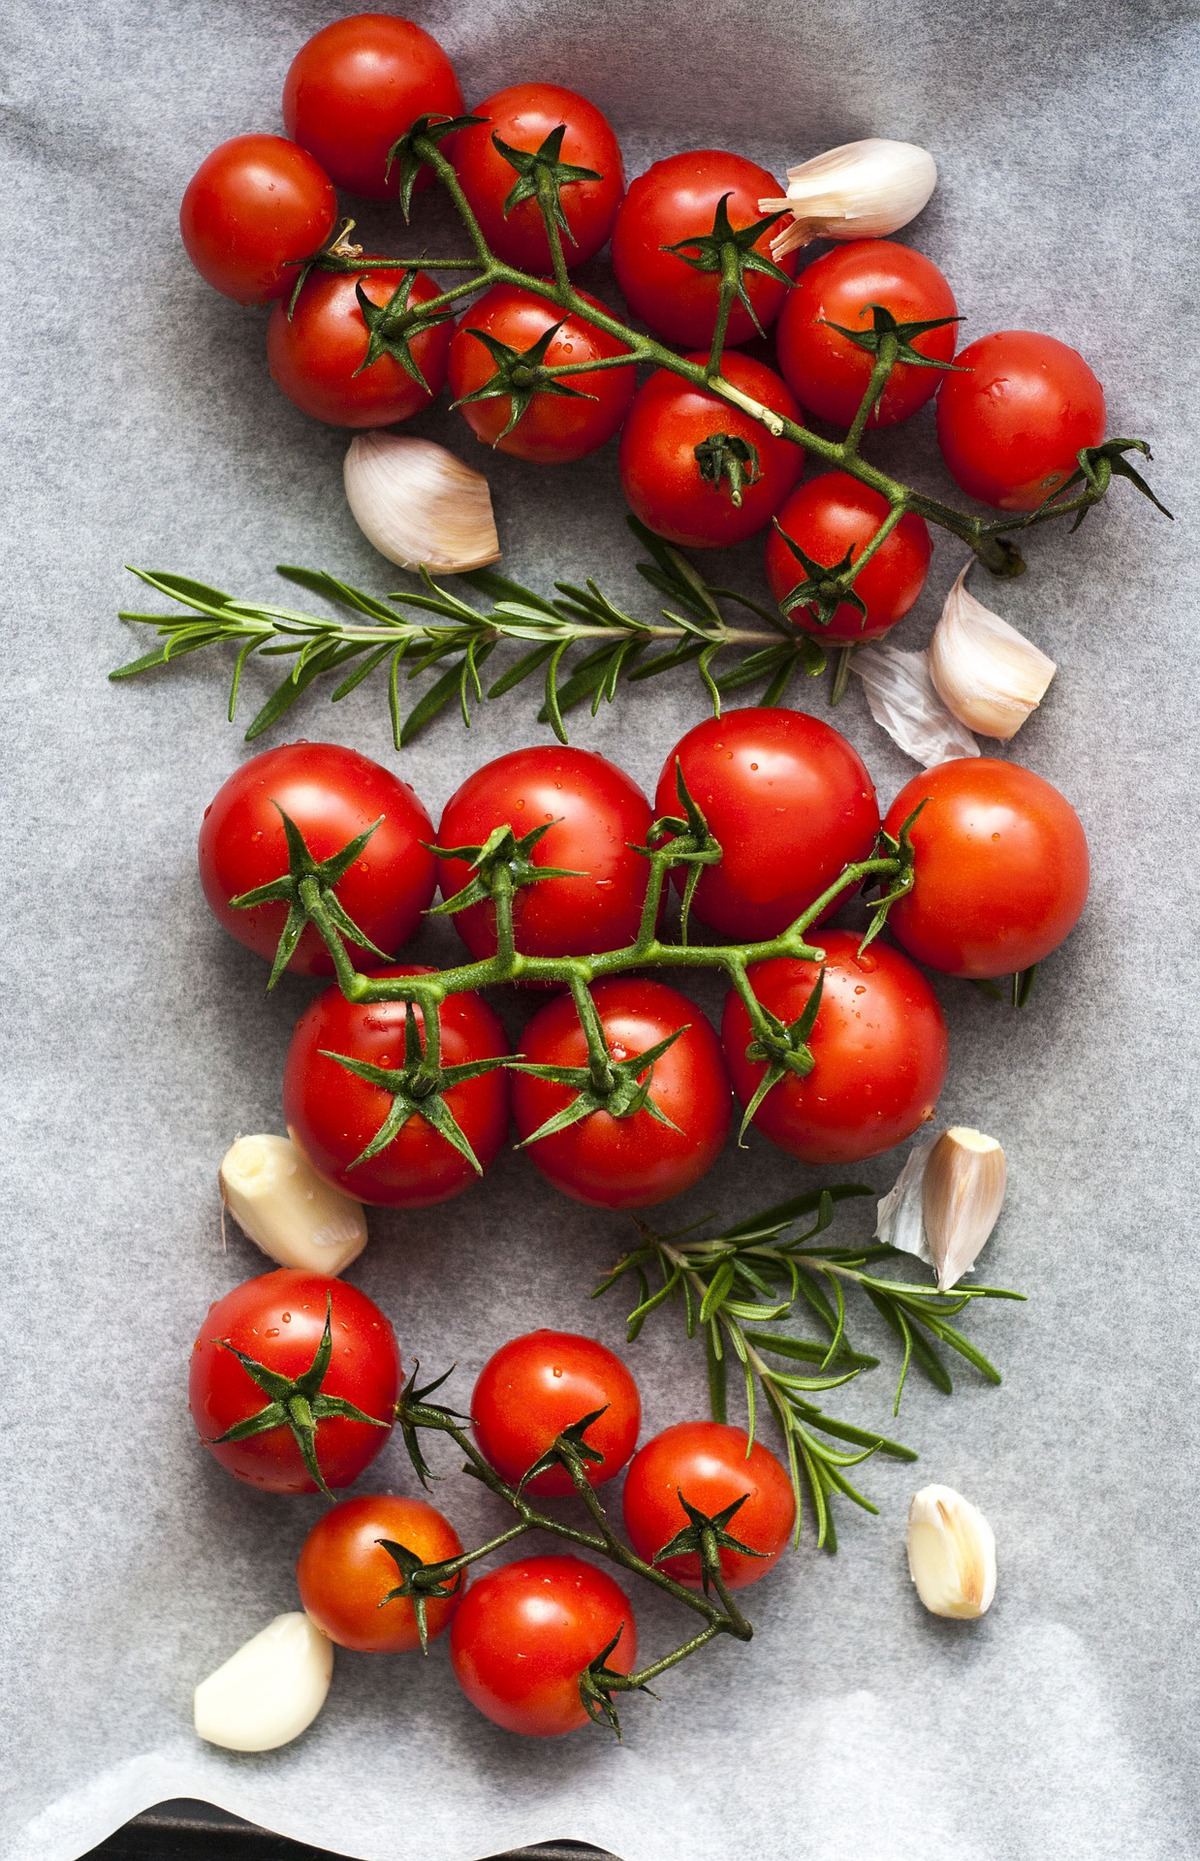 tomatoes-3574427_1920.jpg